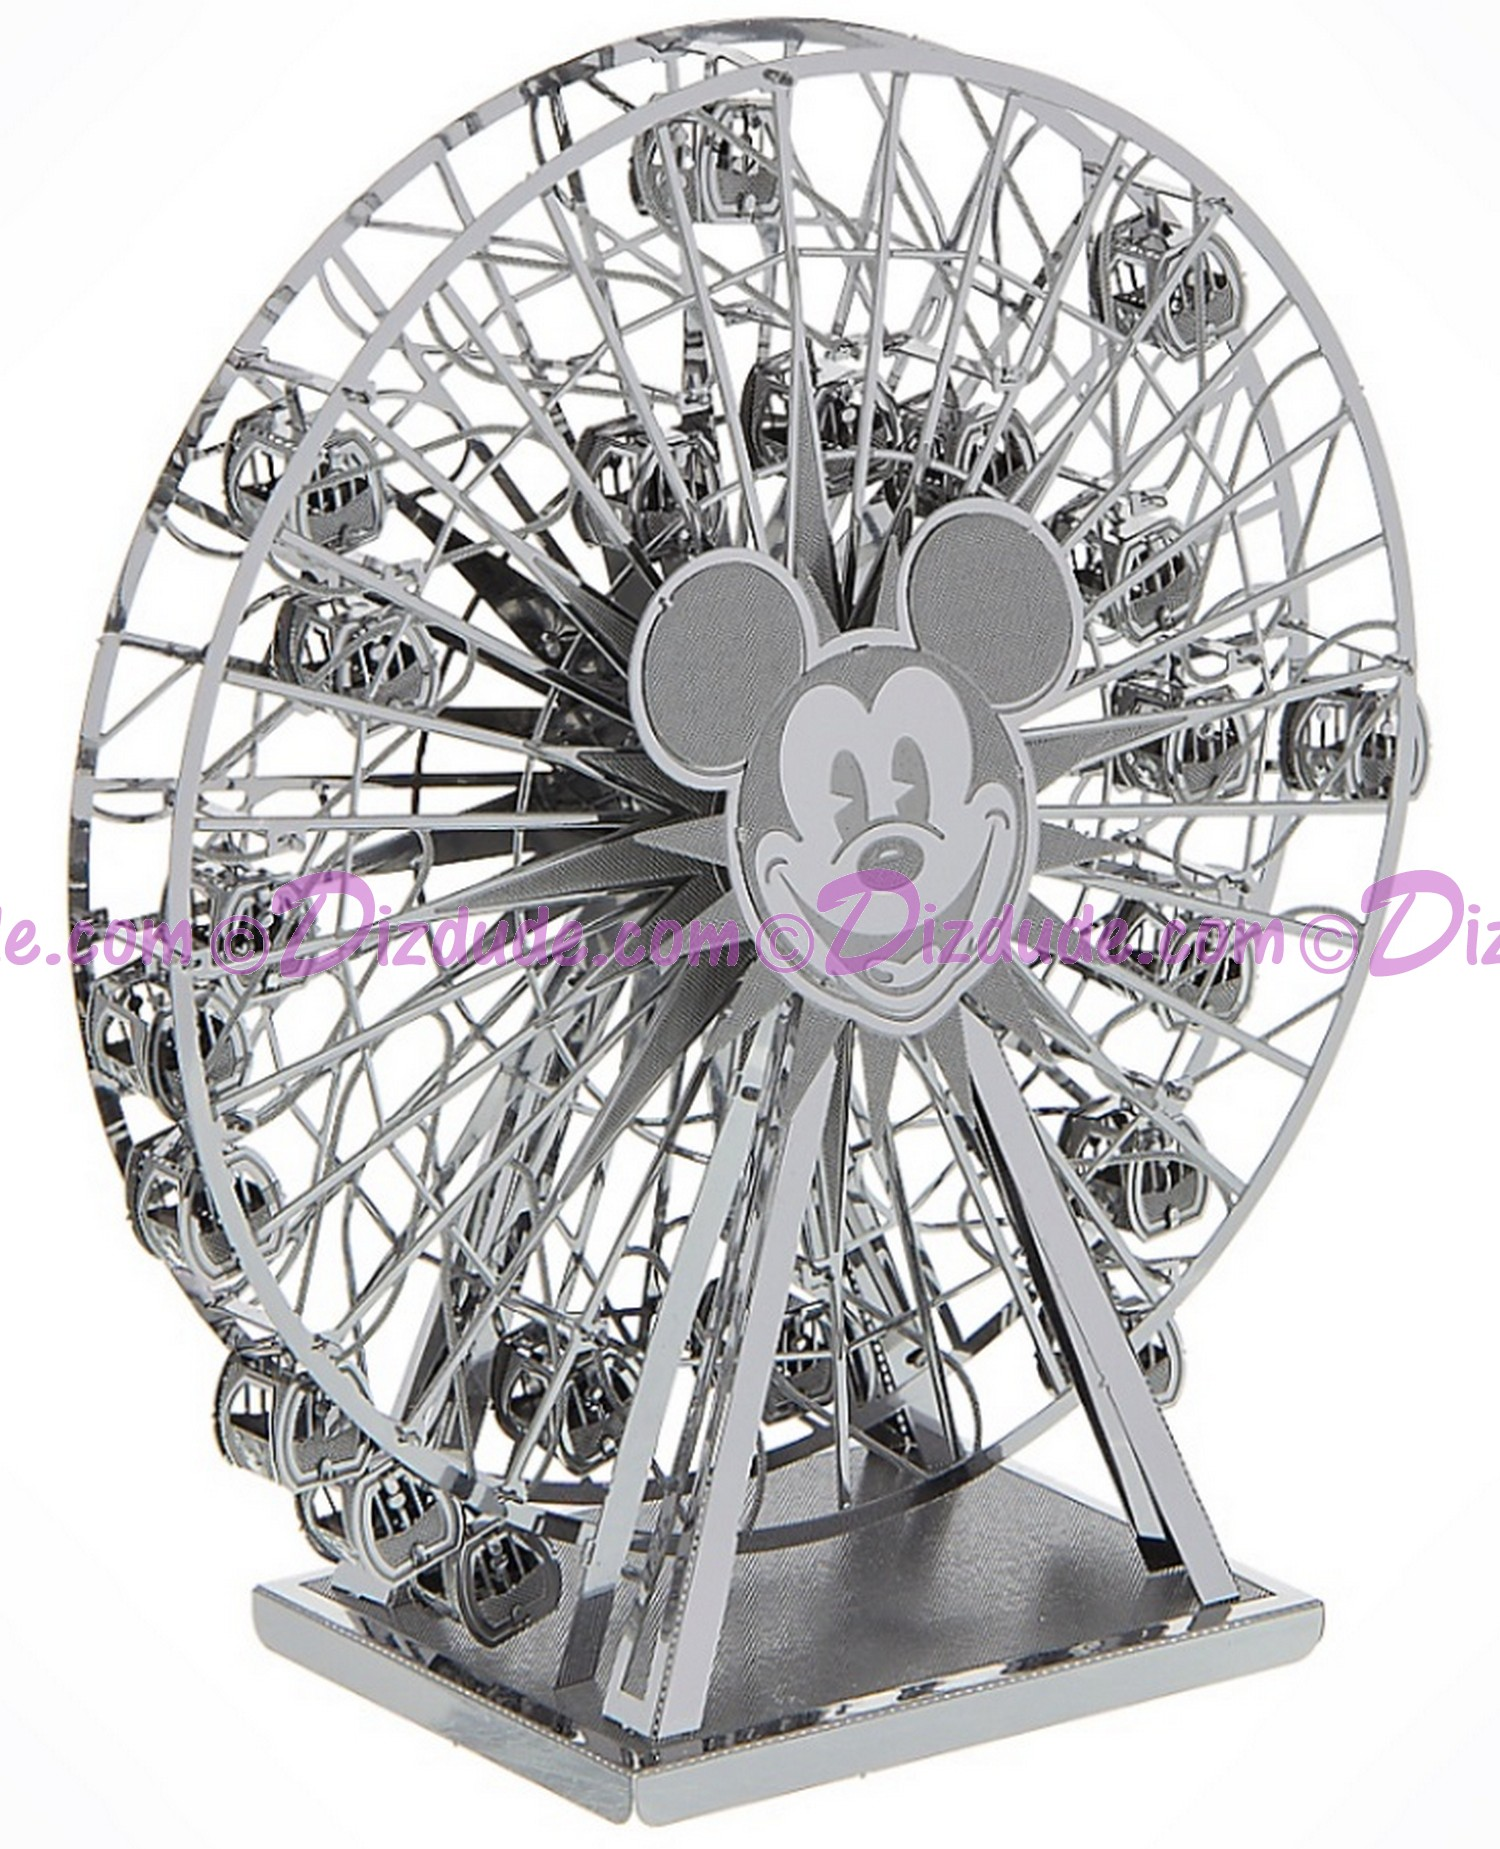 Disneyland Mickey's Fun Wheel 3D Metal Model Kit - Disney Exclusive © Dizdude.com